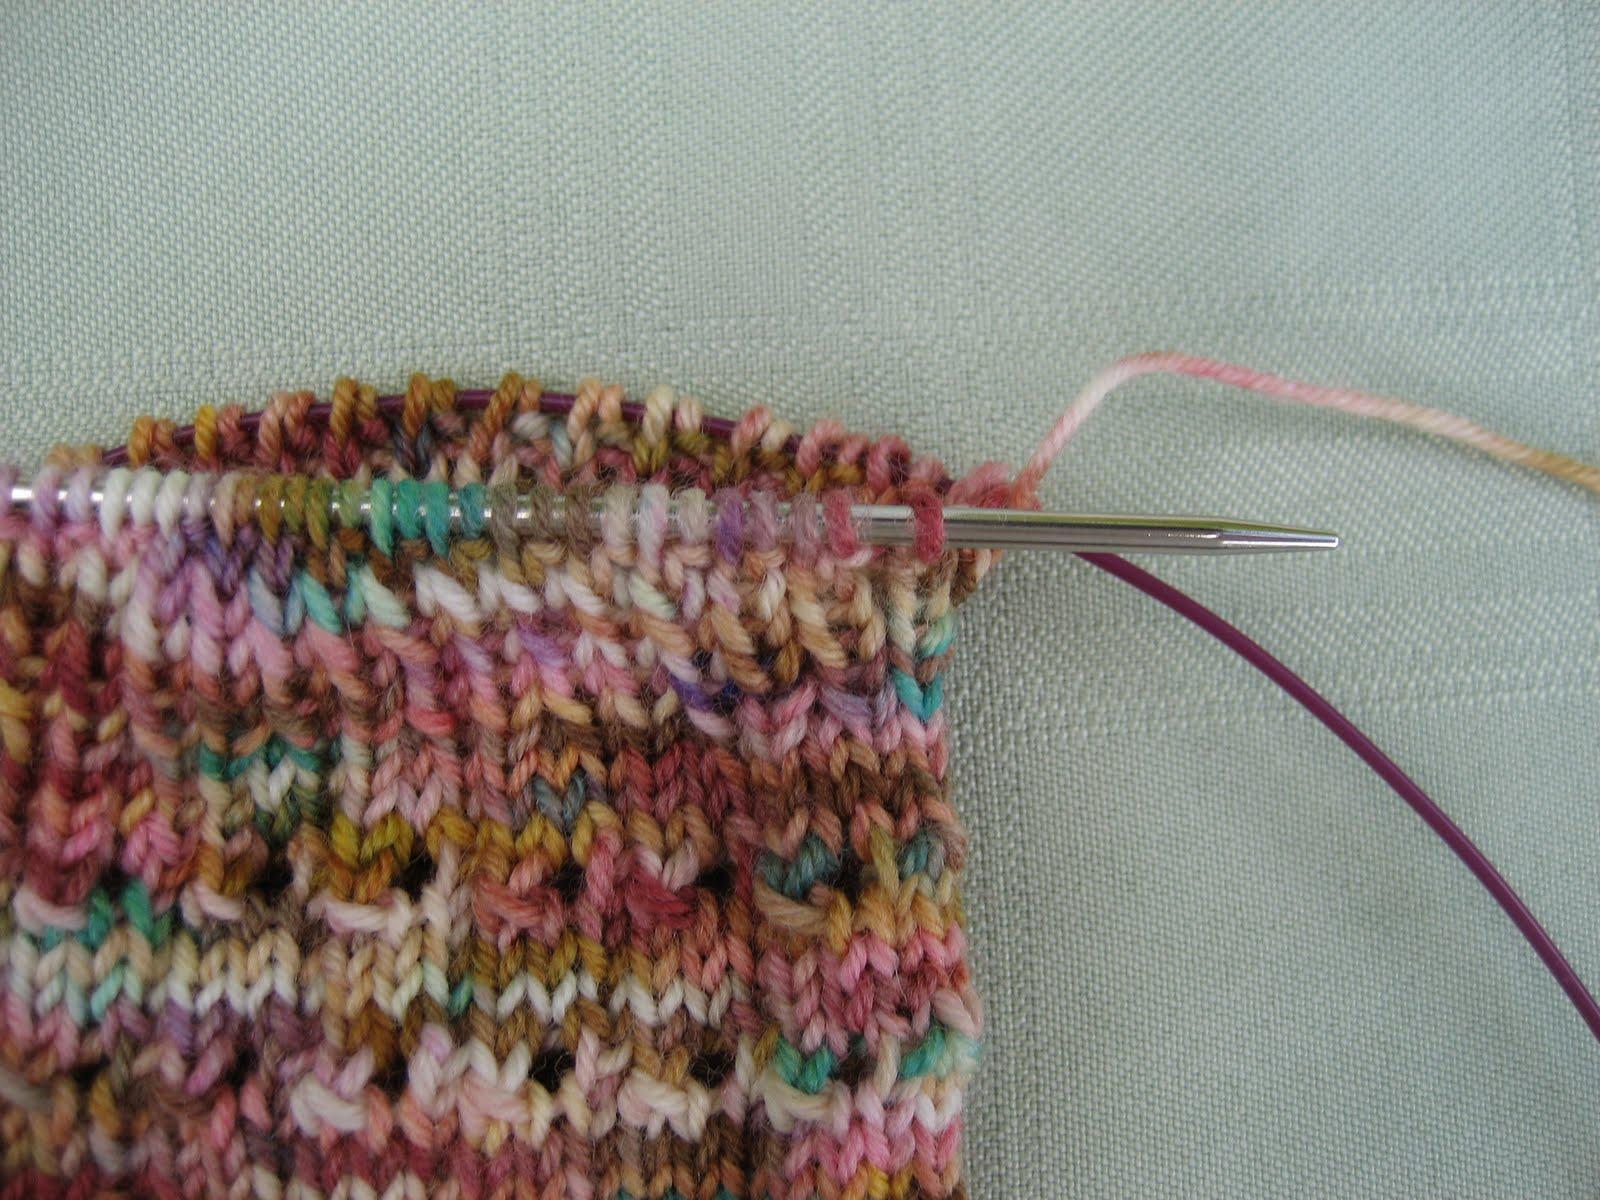 Kitchener Stitch With Knitting Needles : Kitchener Stitch Bind Off Knitty